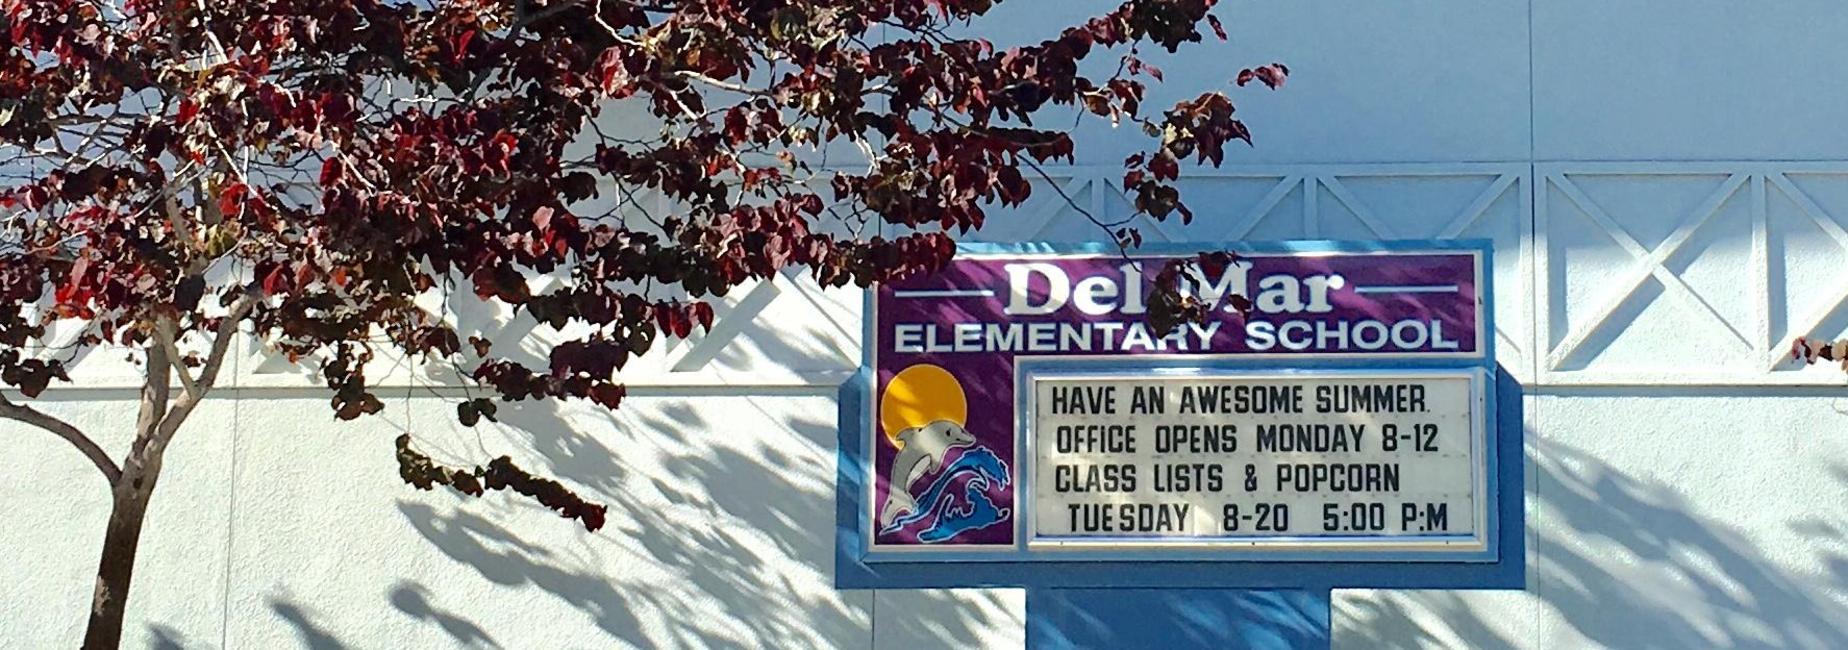 Del Mar Elementary